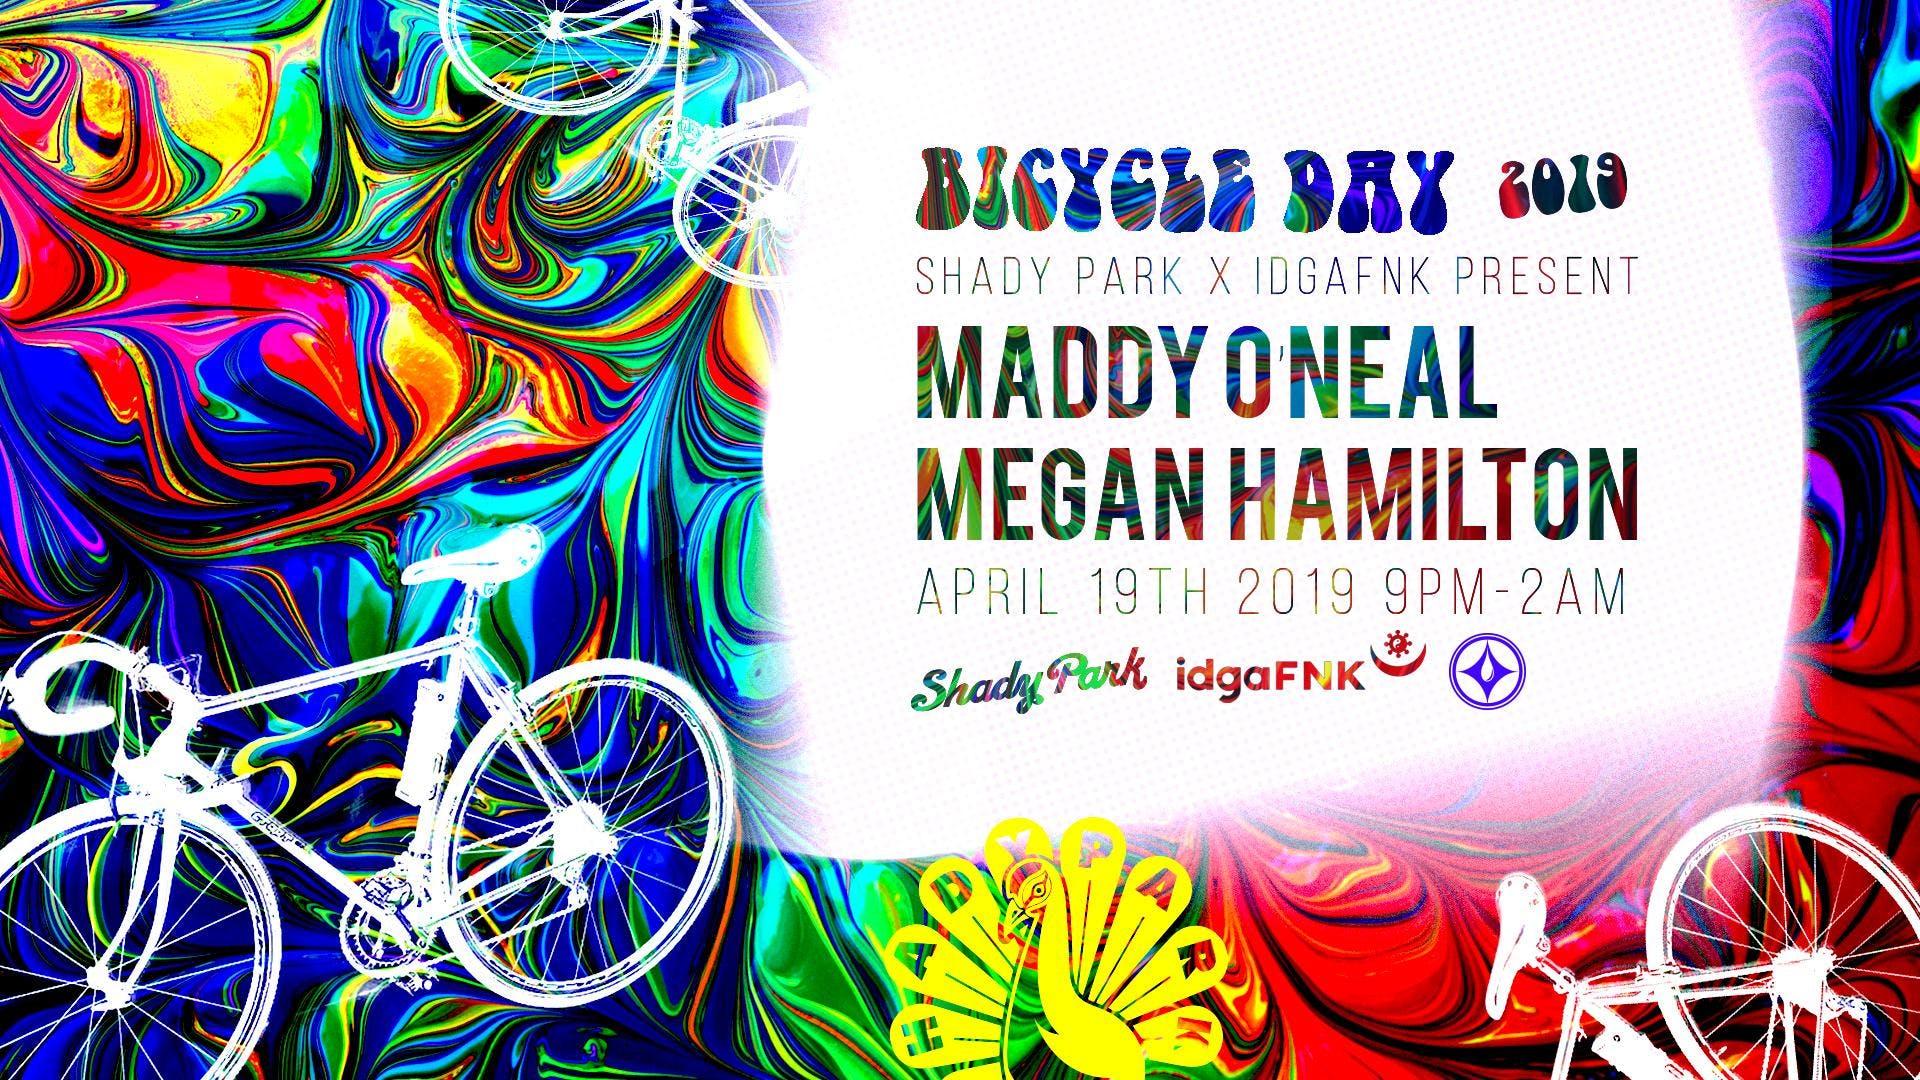 Bicycle Day: Maddy O'Neal and Megan Hamilton